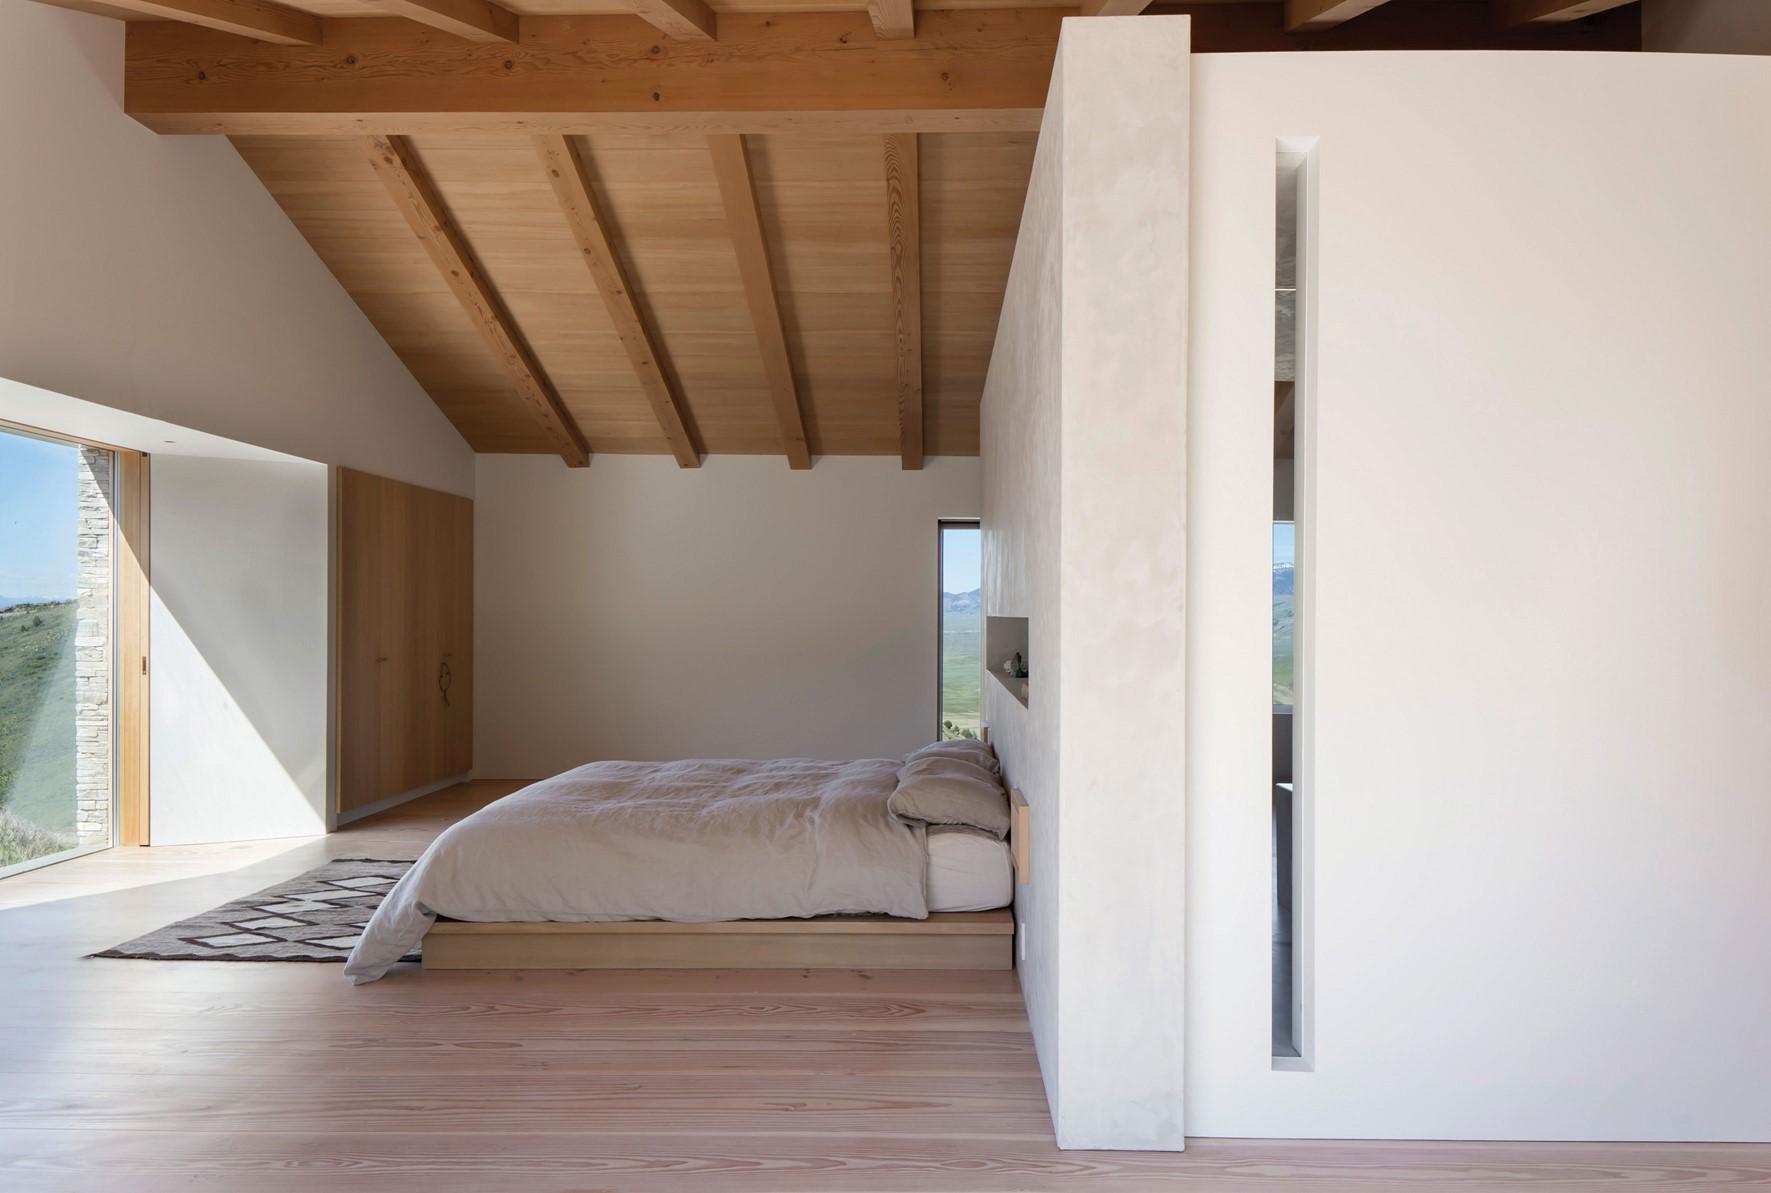 solid-douglas-floor_lye-natural-oil_jackson-hole_bedroom-wood_dinesen.jpg